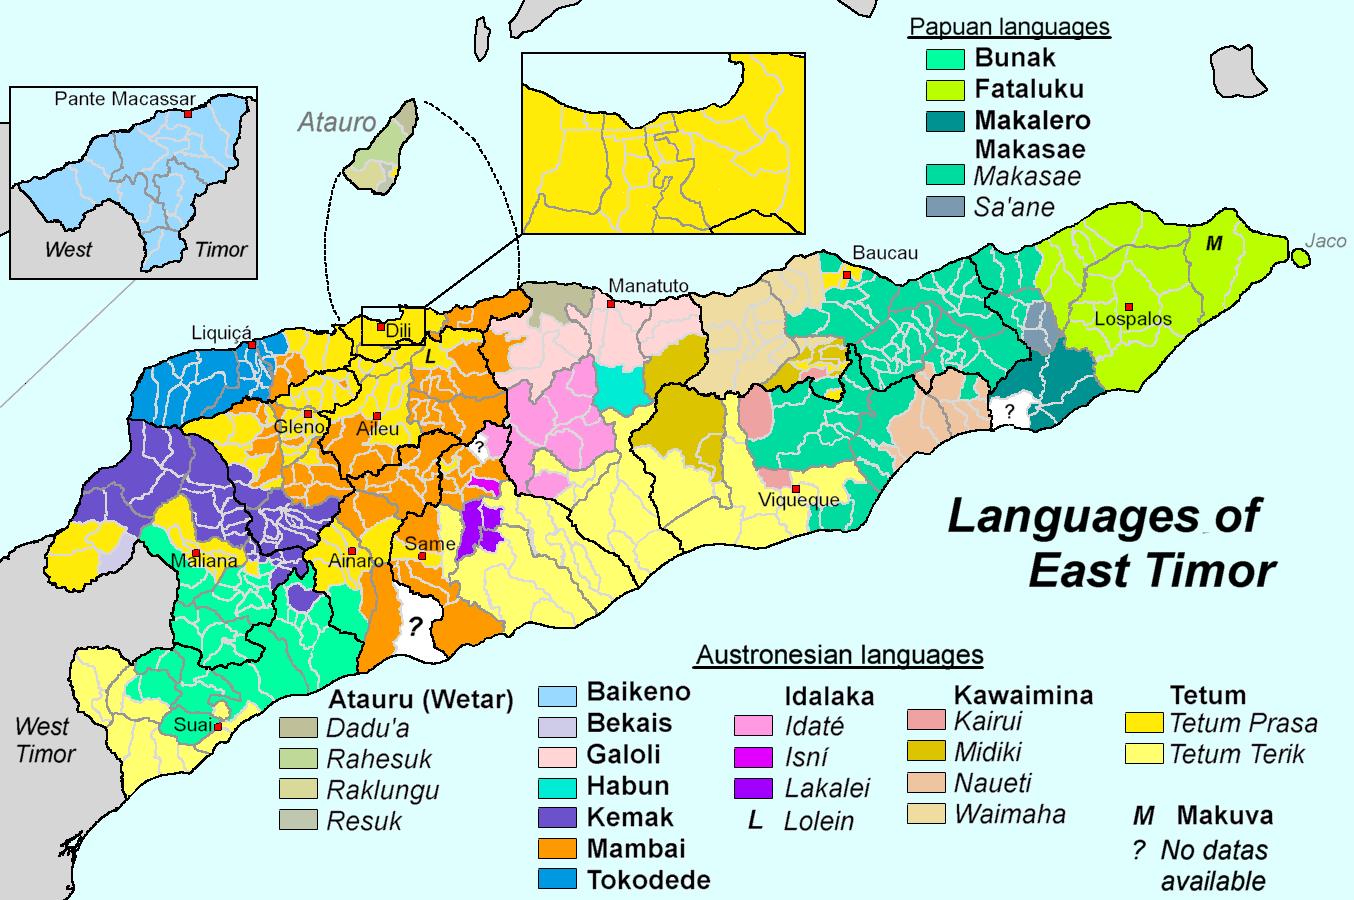 Sprachen_Osttimors-en